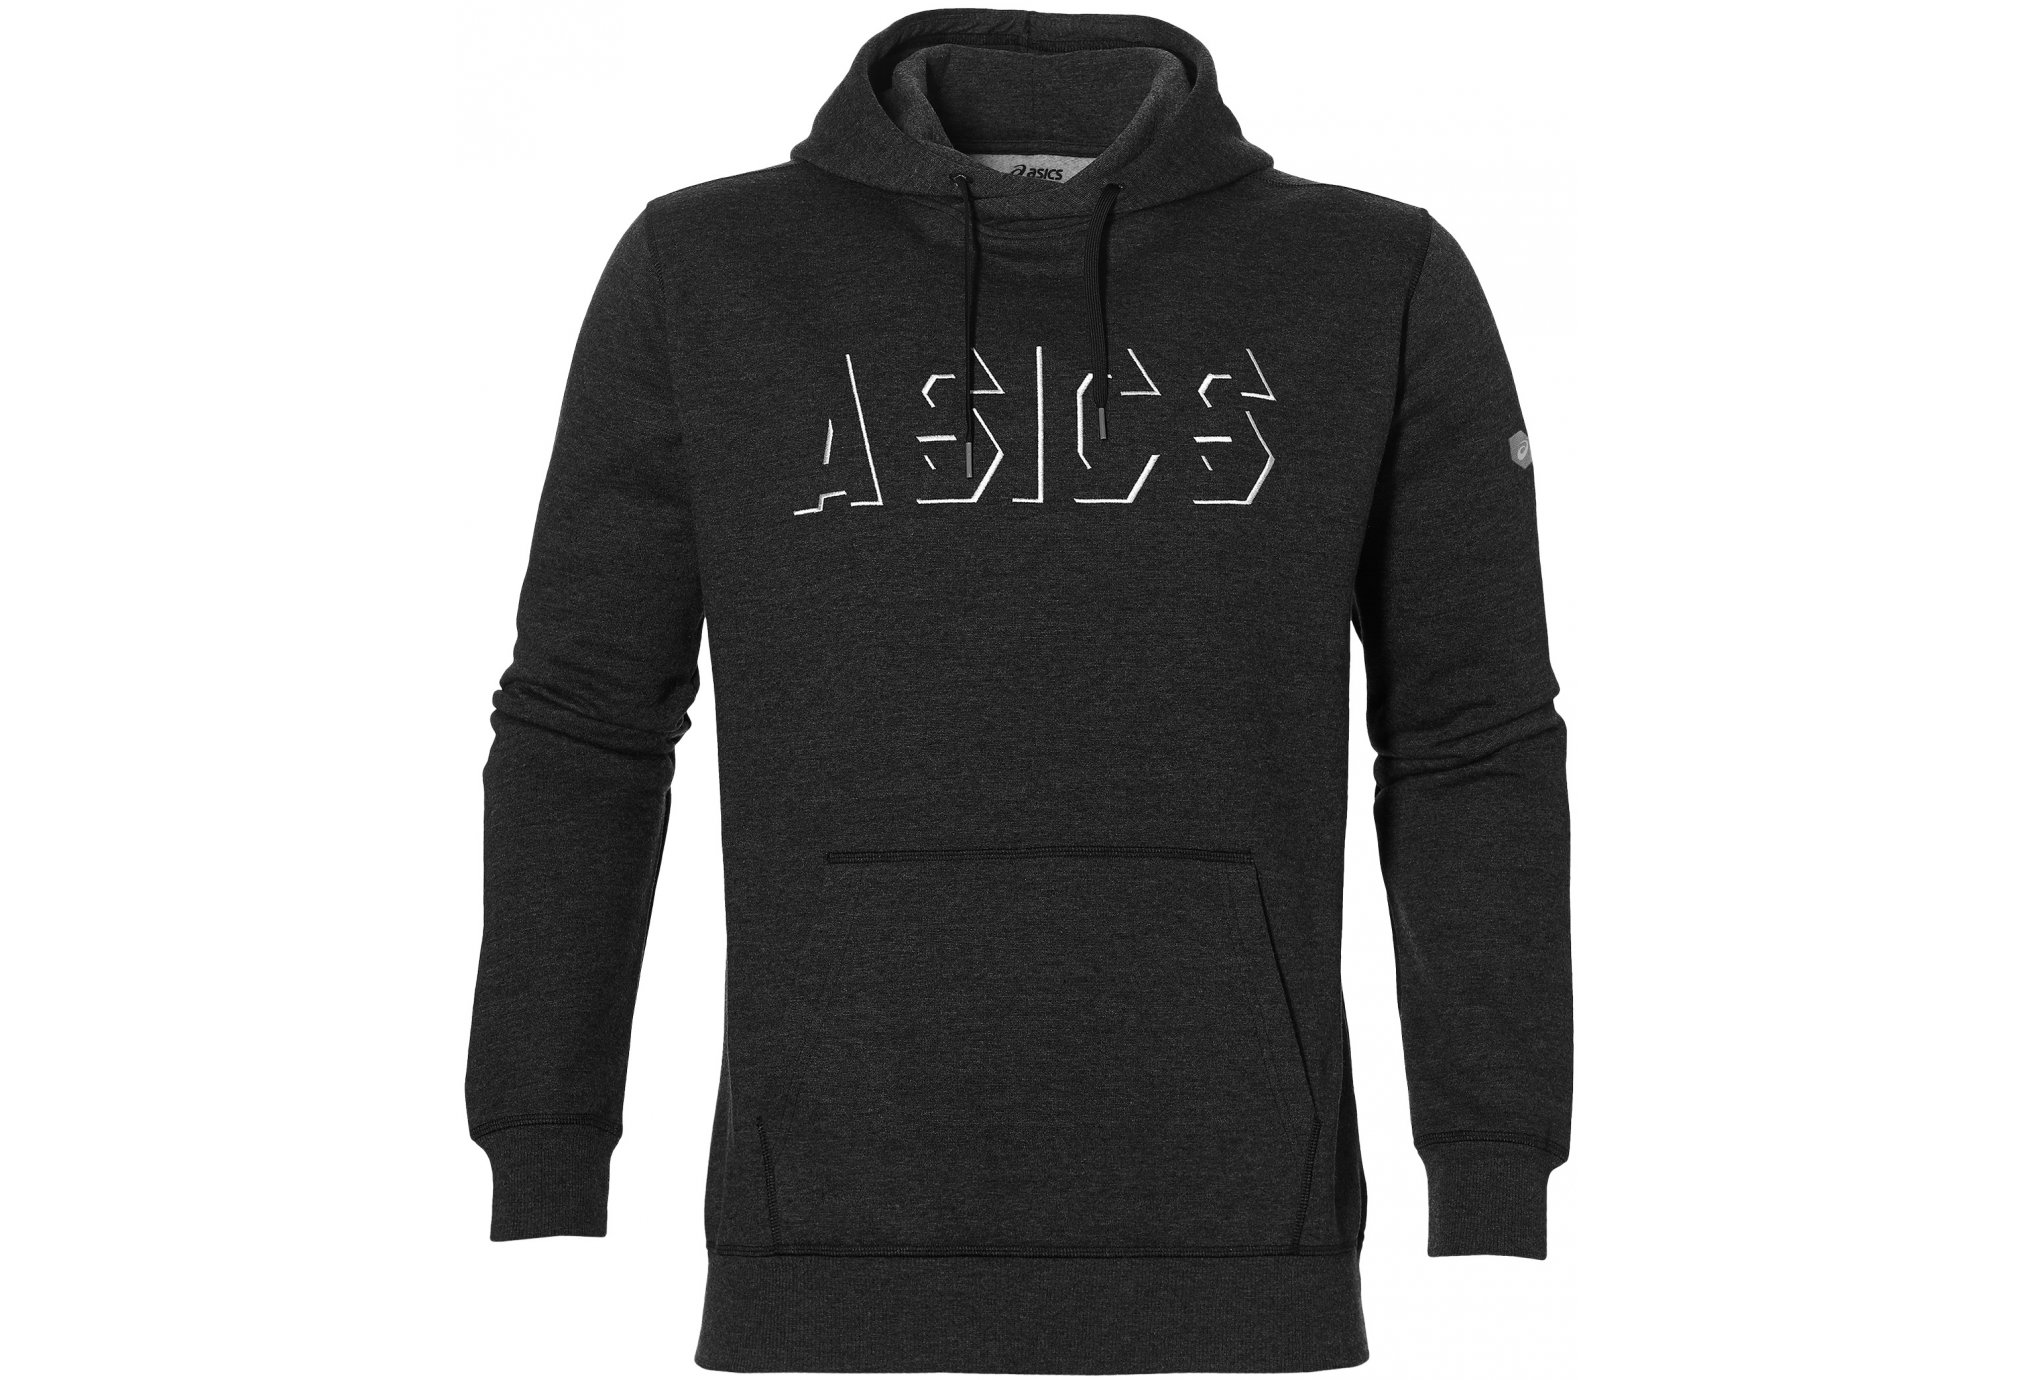 Asics Gpx hoody m vêtement running homme